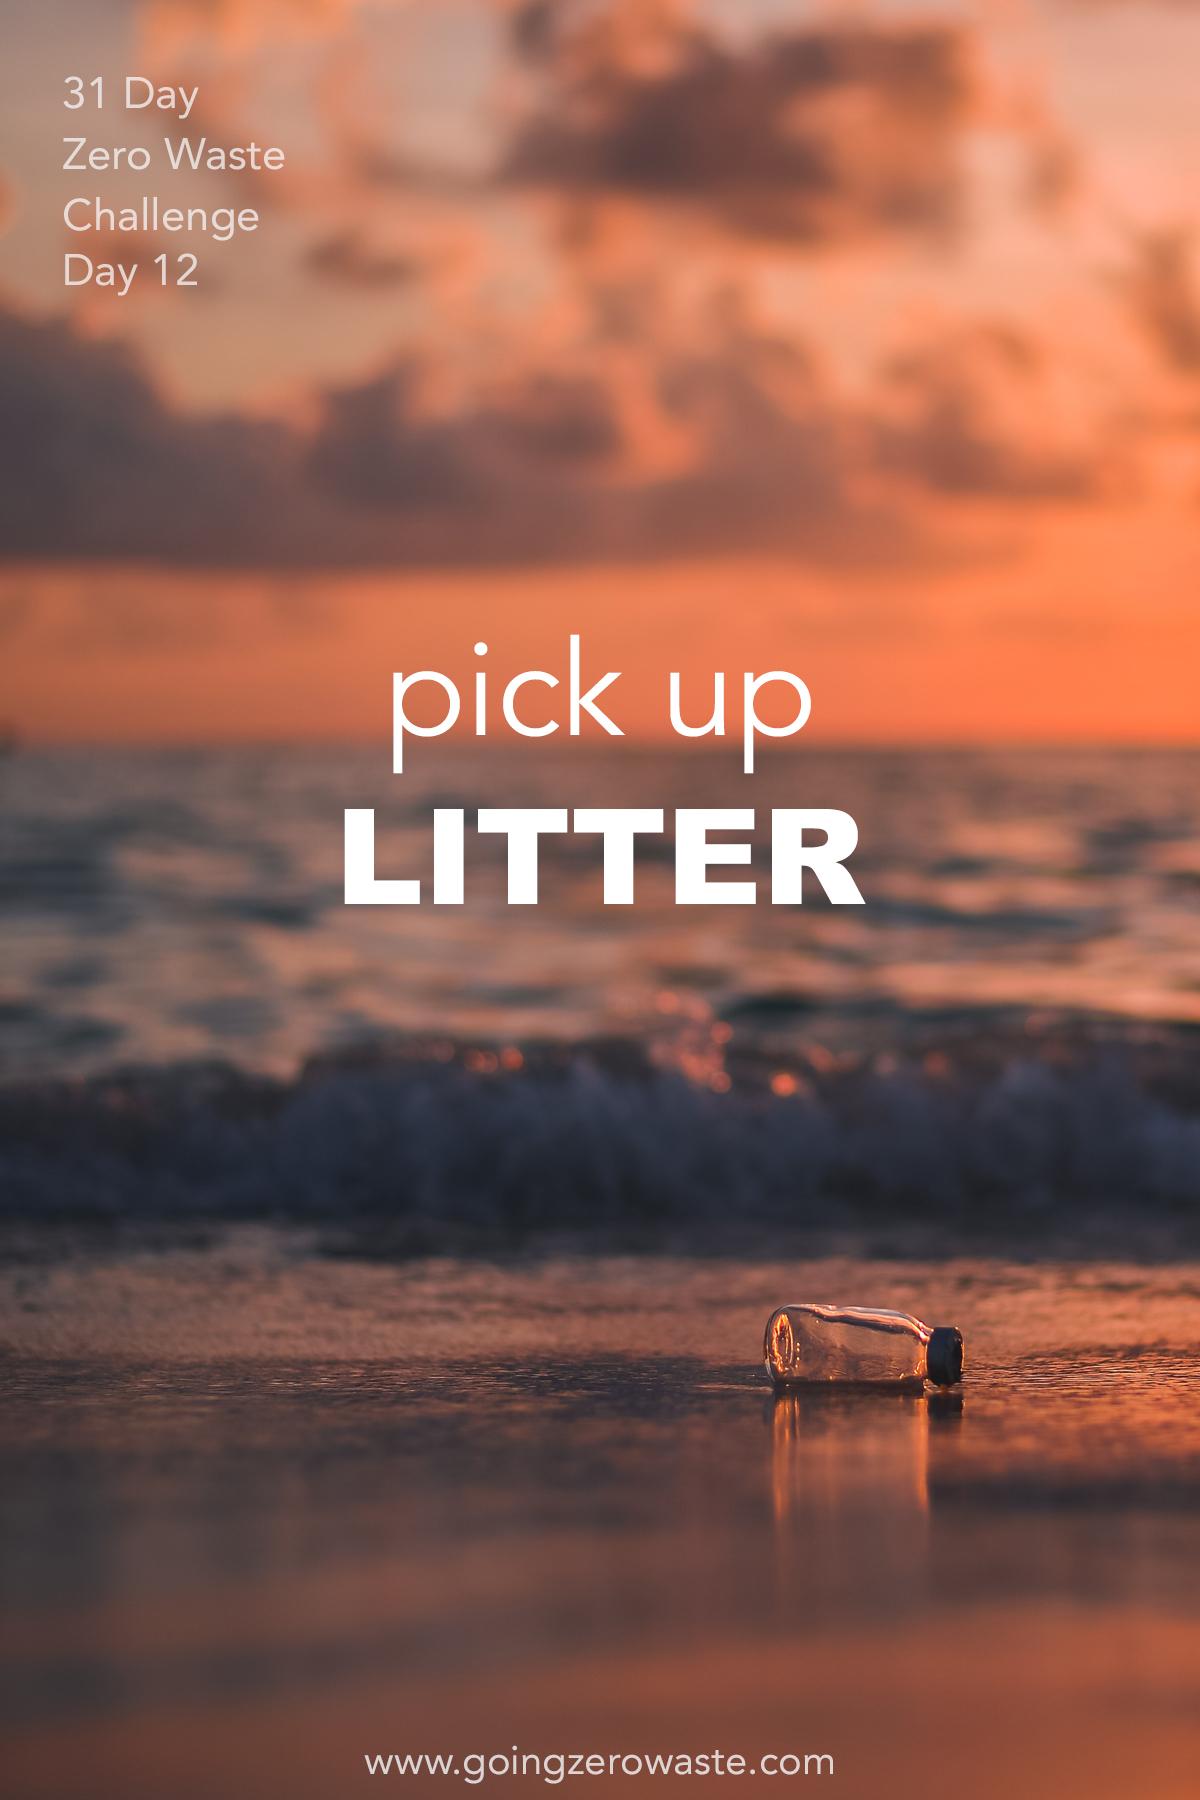 Pick up Litter Day 12 of the Zero Waste Challenge from www.goingzerowaste.com #litter #ecofriendly #zerowaste #zerowastechallenge